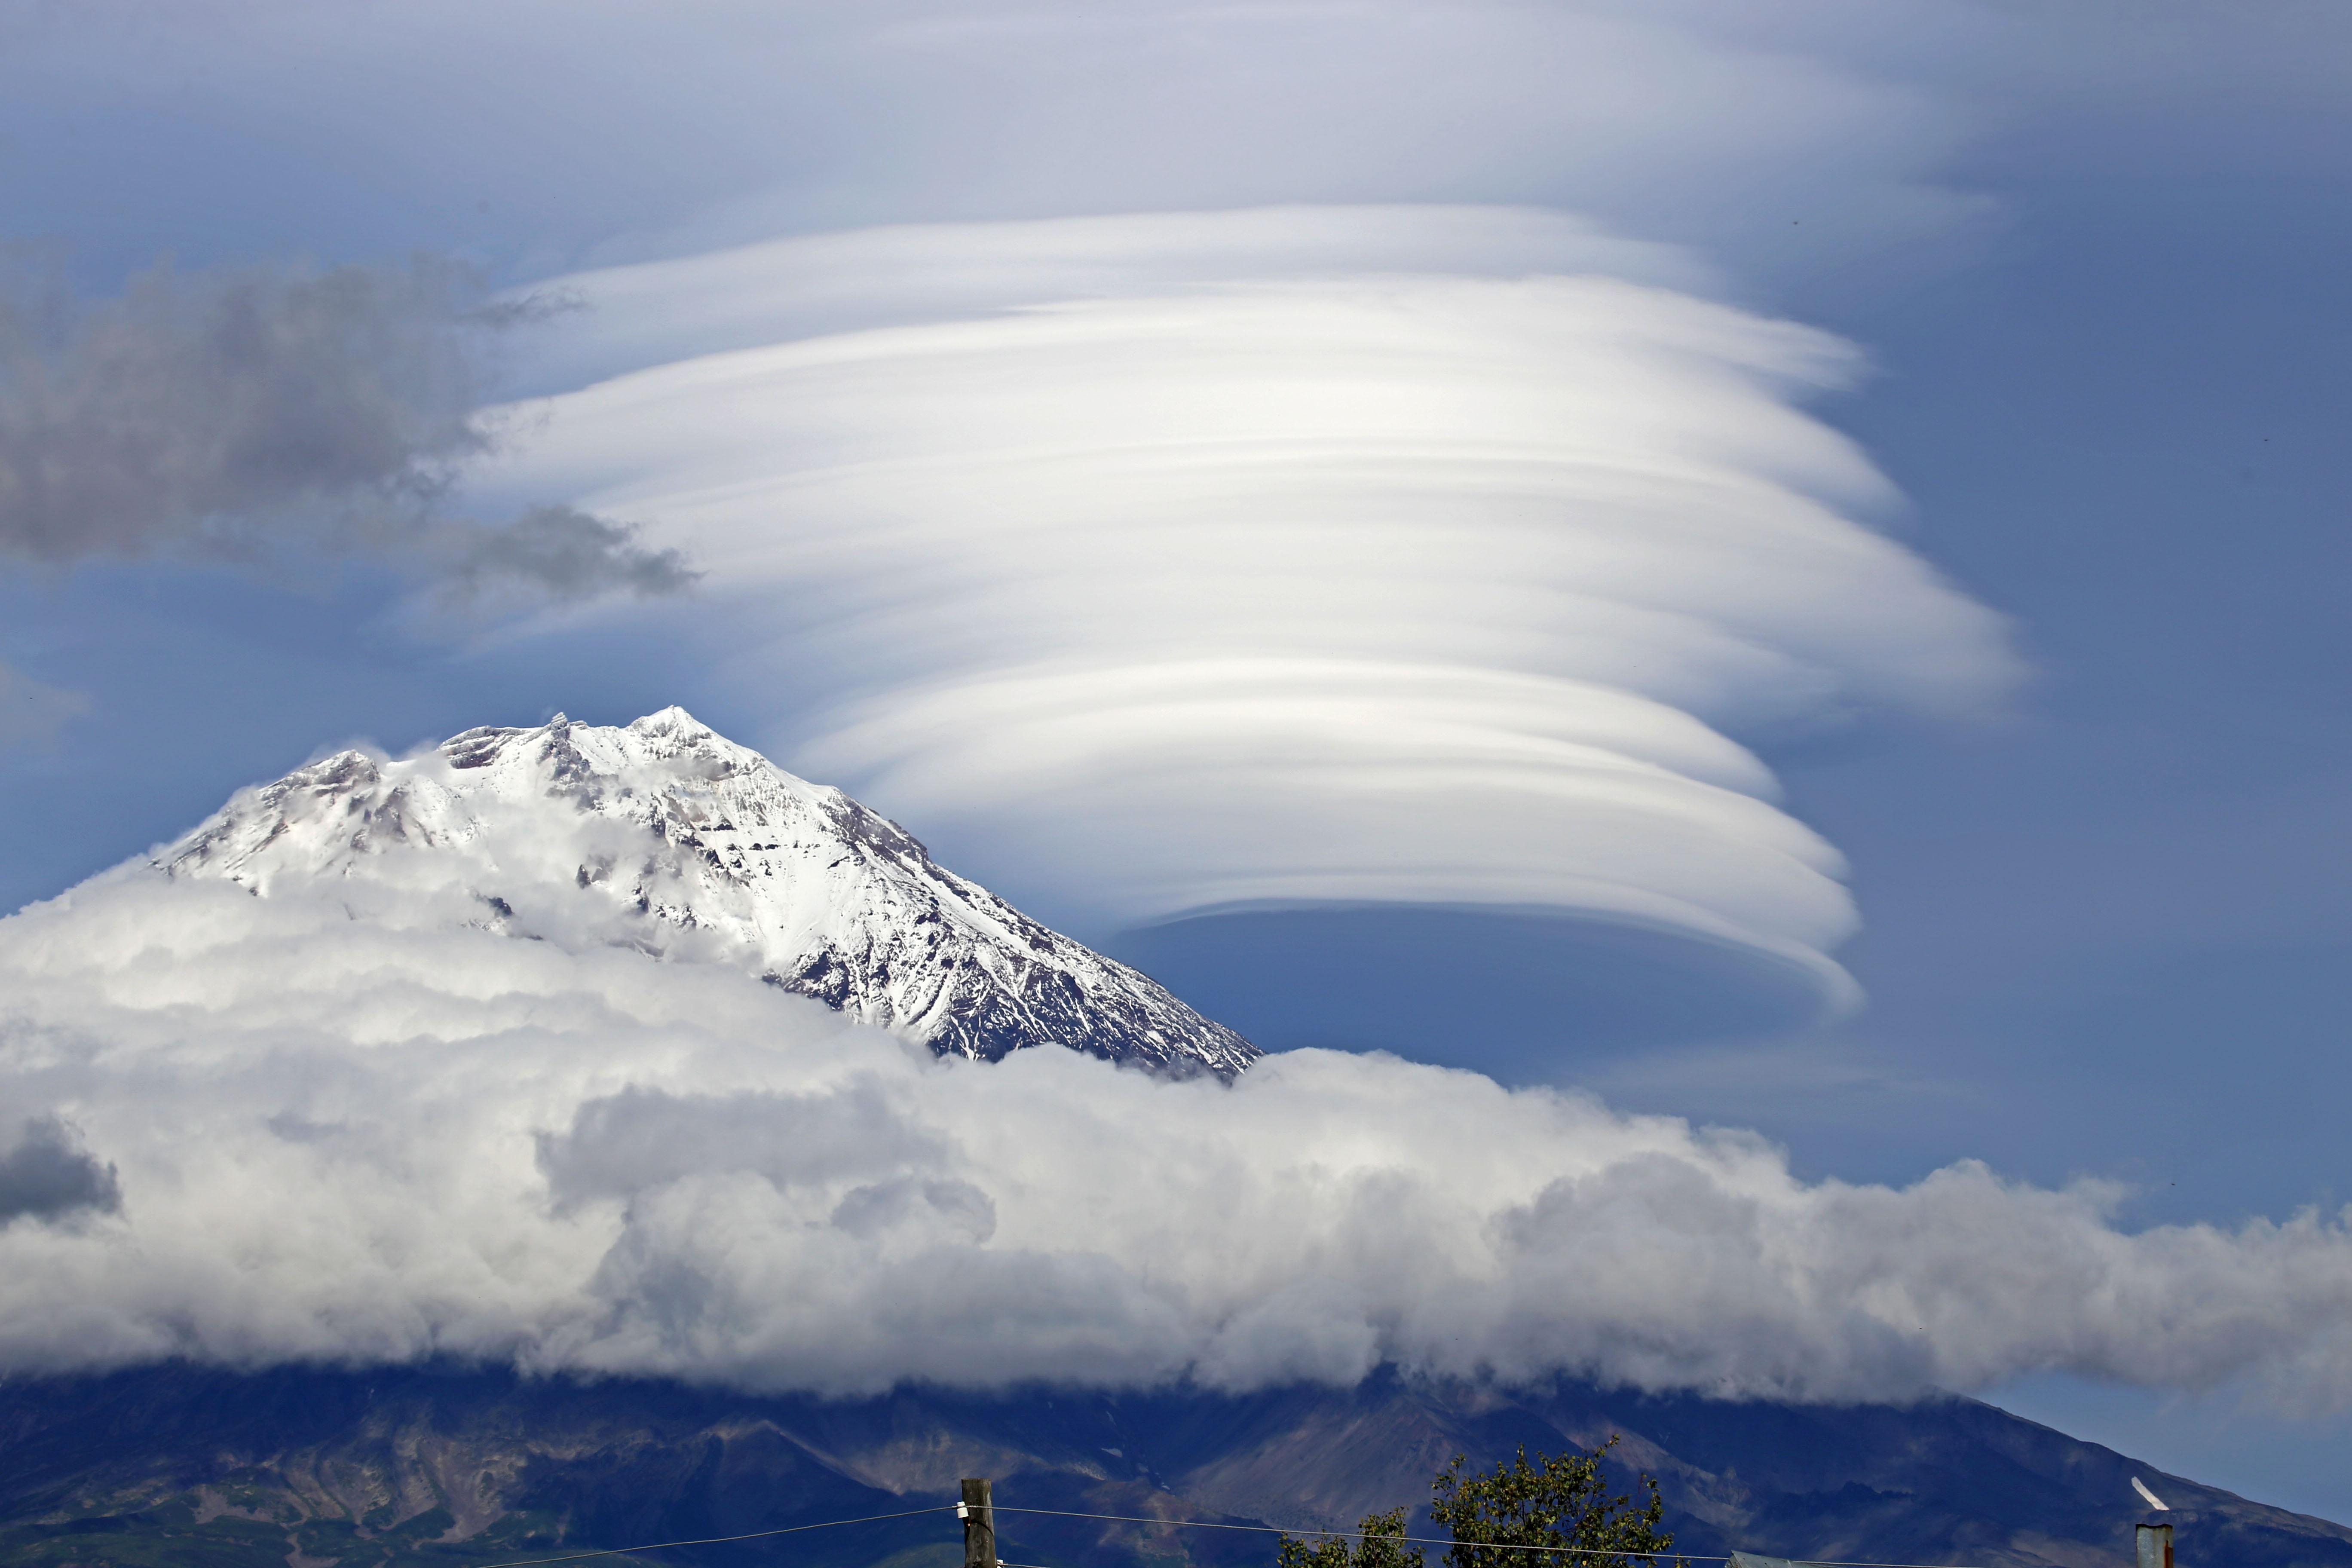 mountains sky light clouds - photo #9